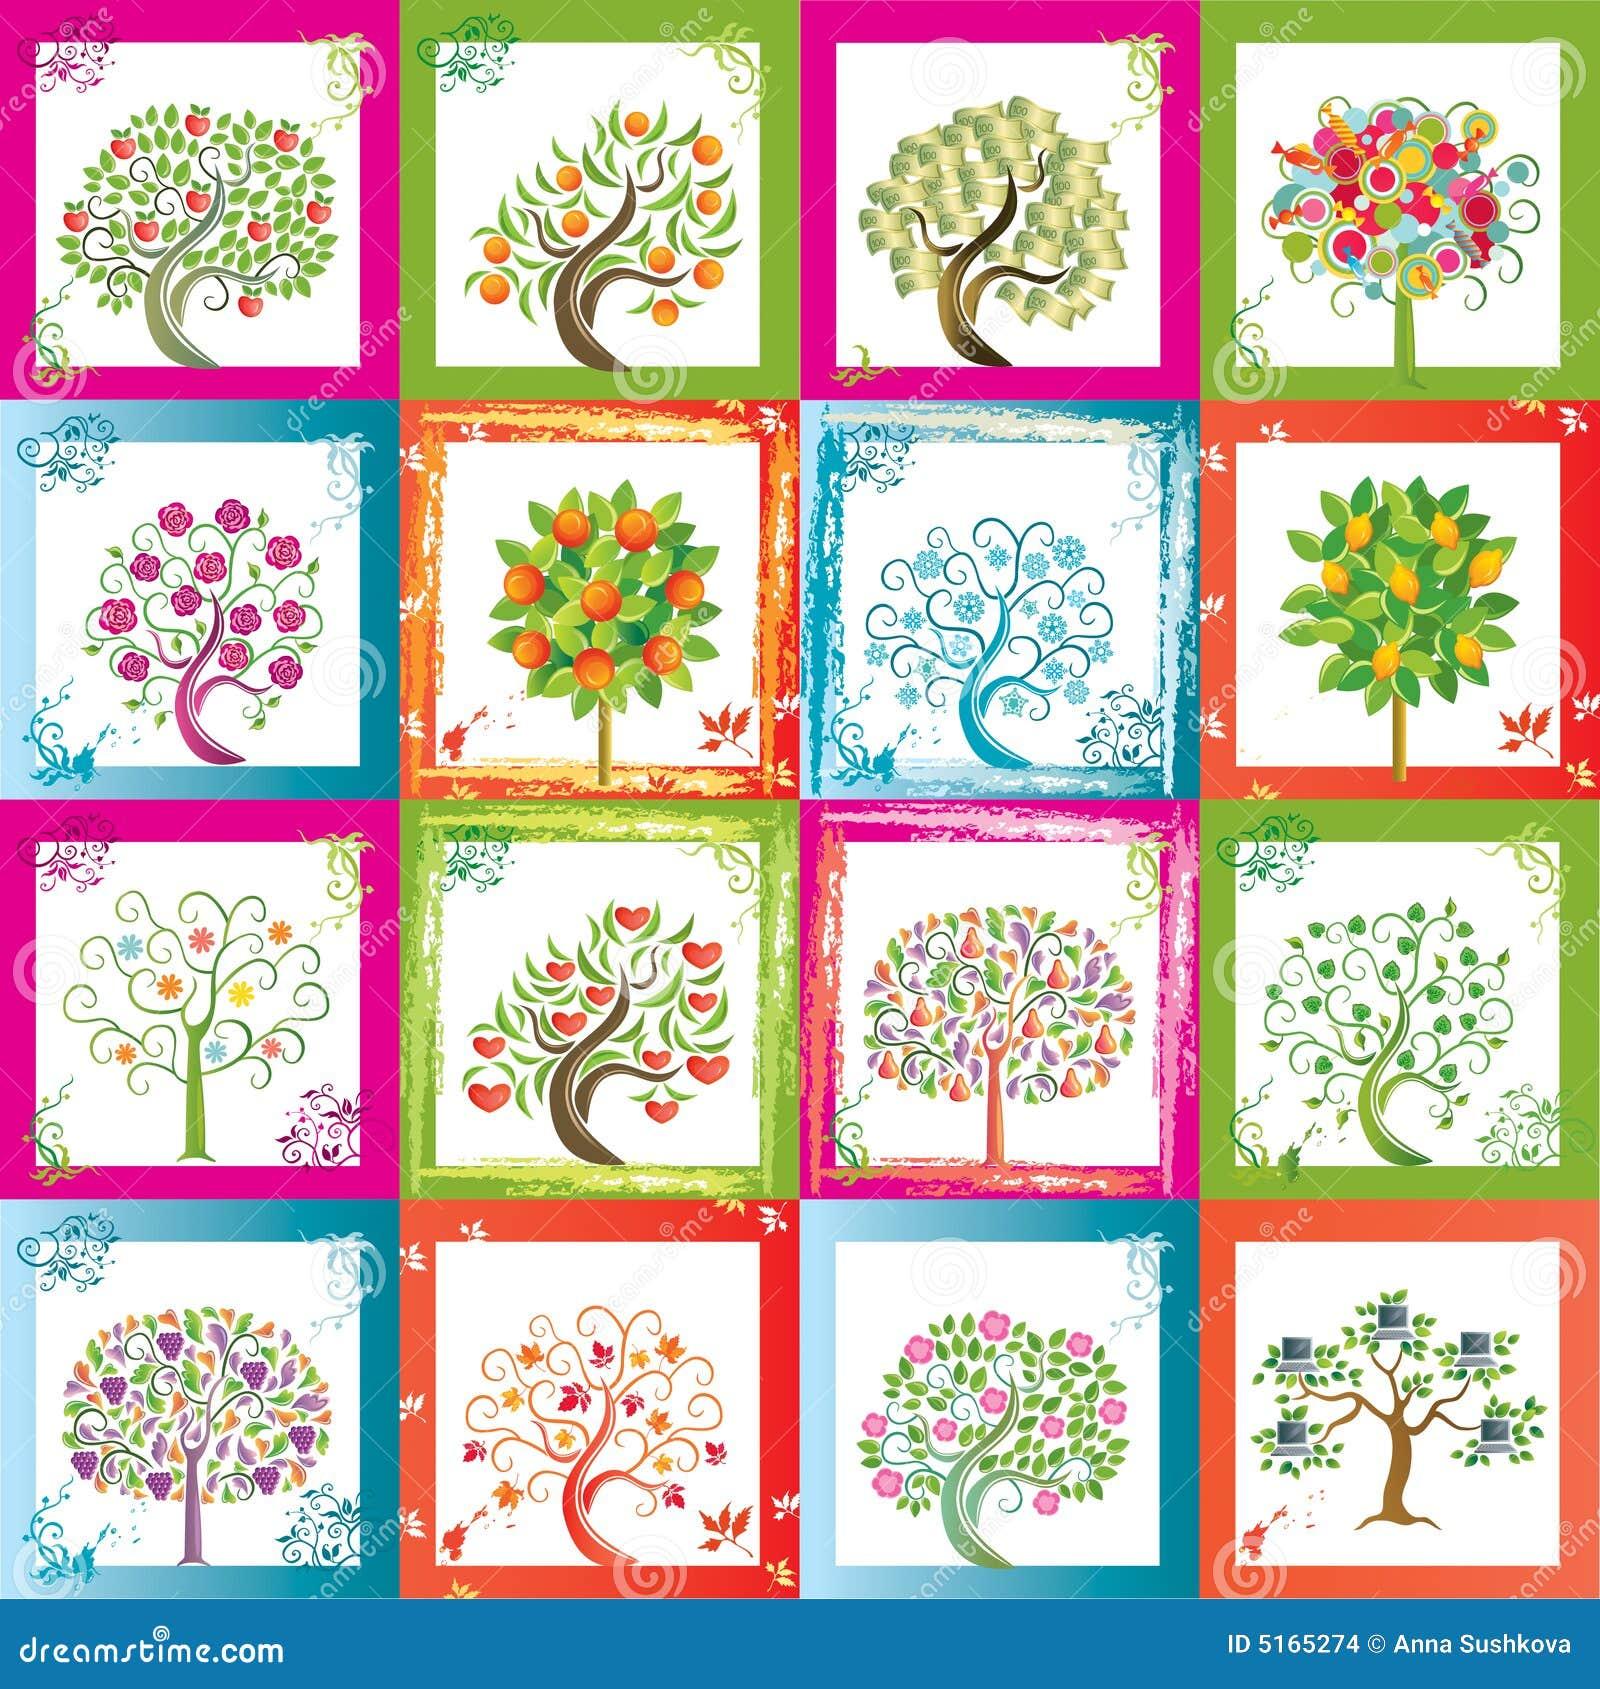 Sixteen trees